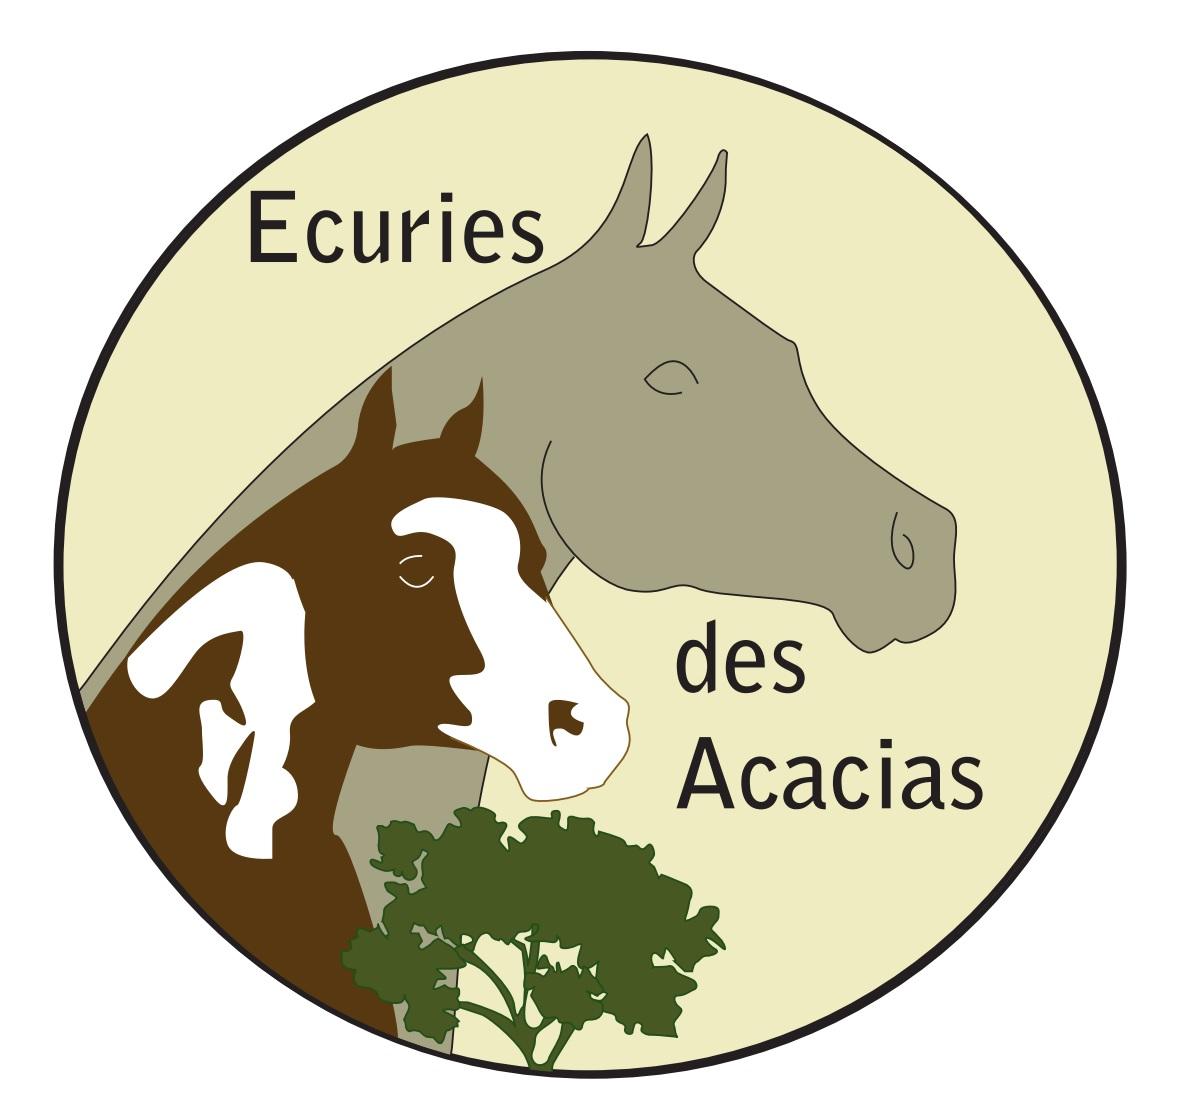 Écurie des Acacias